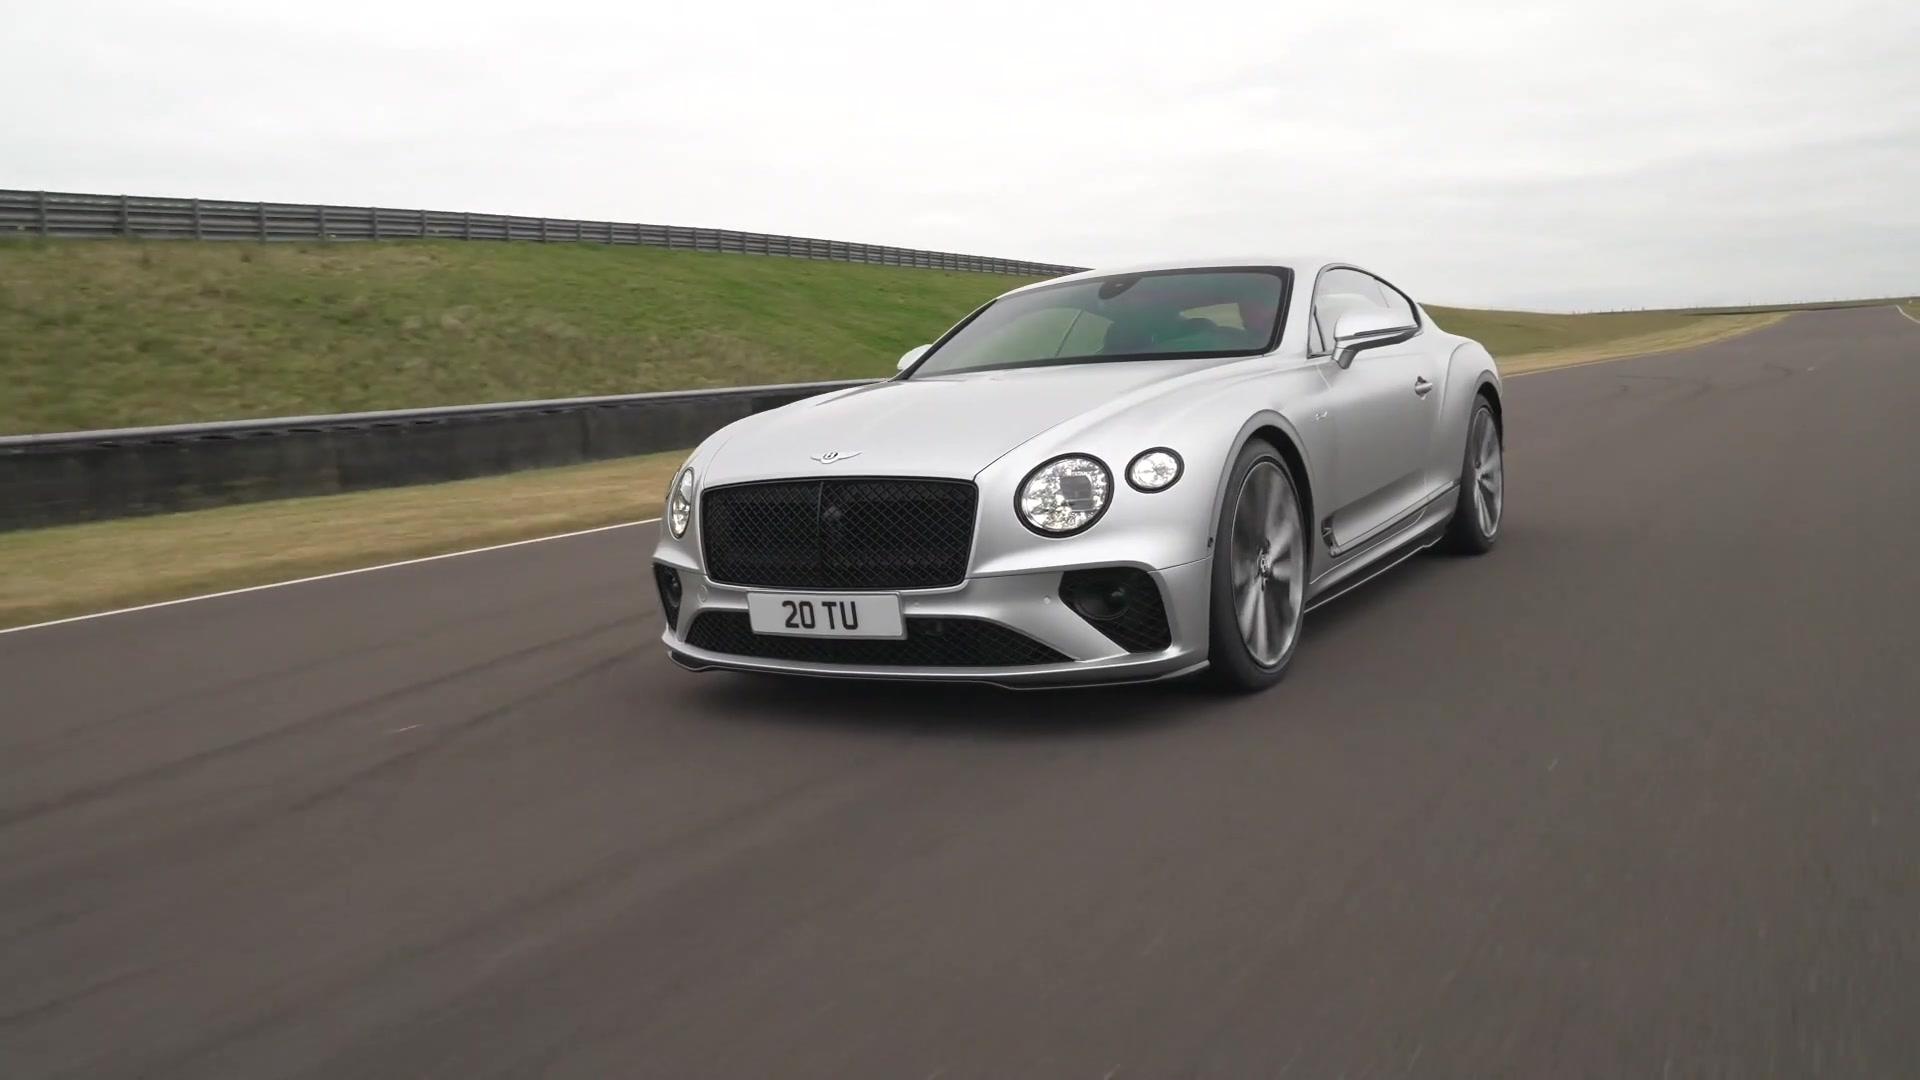 The new Bentley Continental GT Speed Design